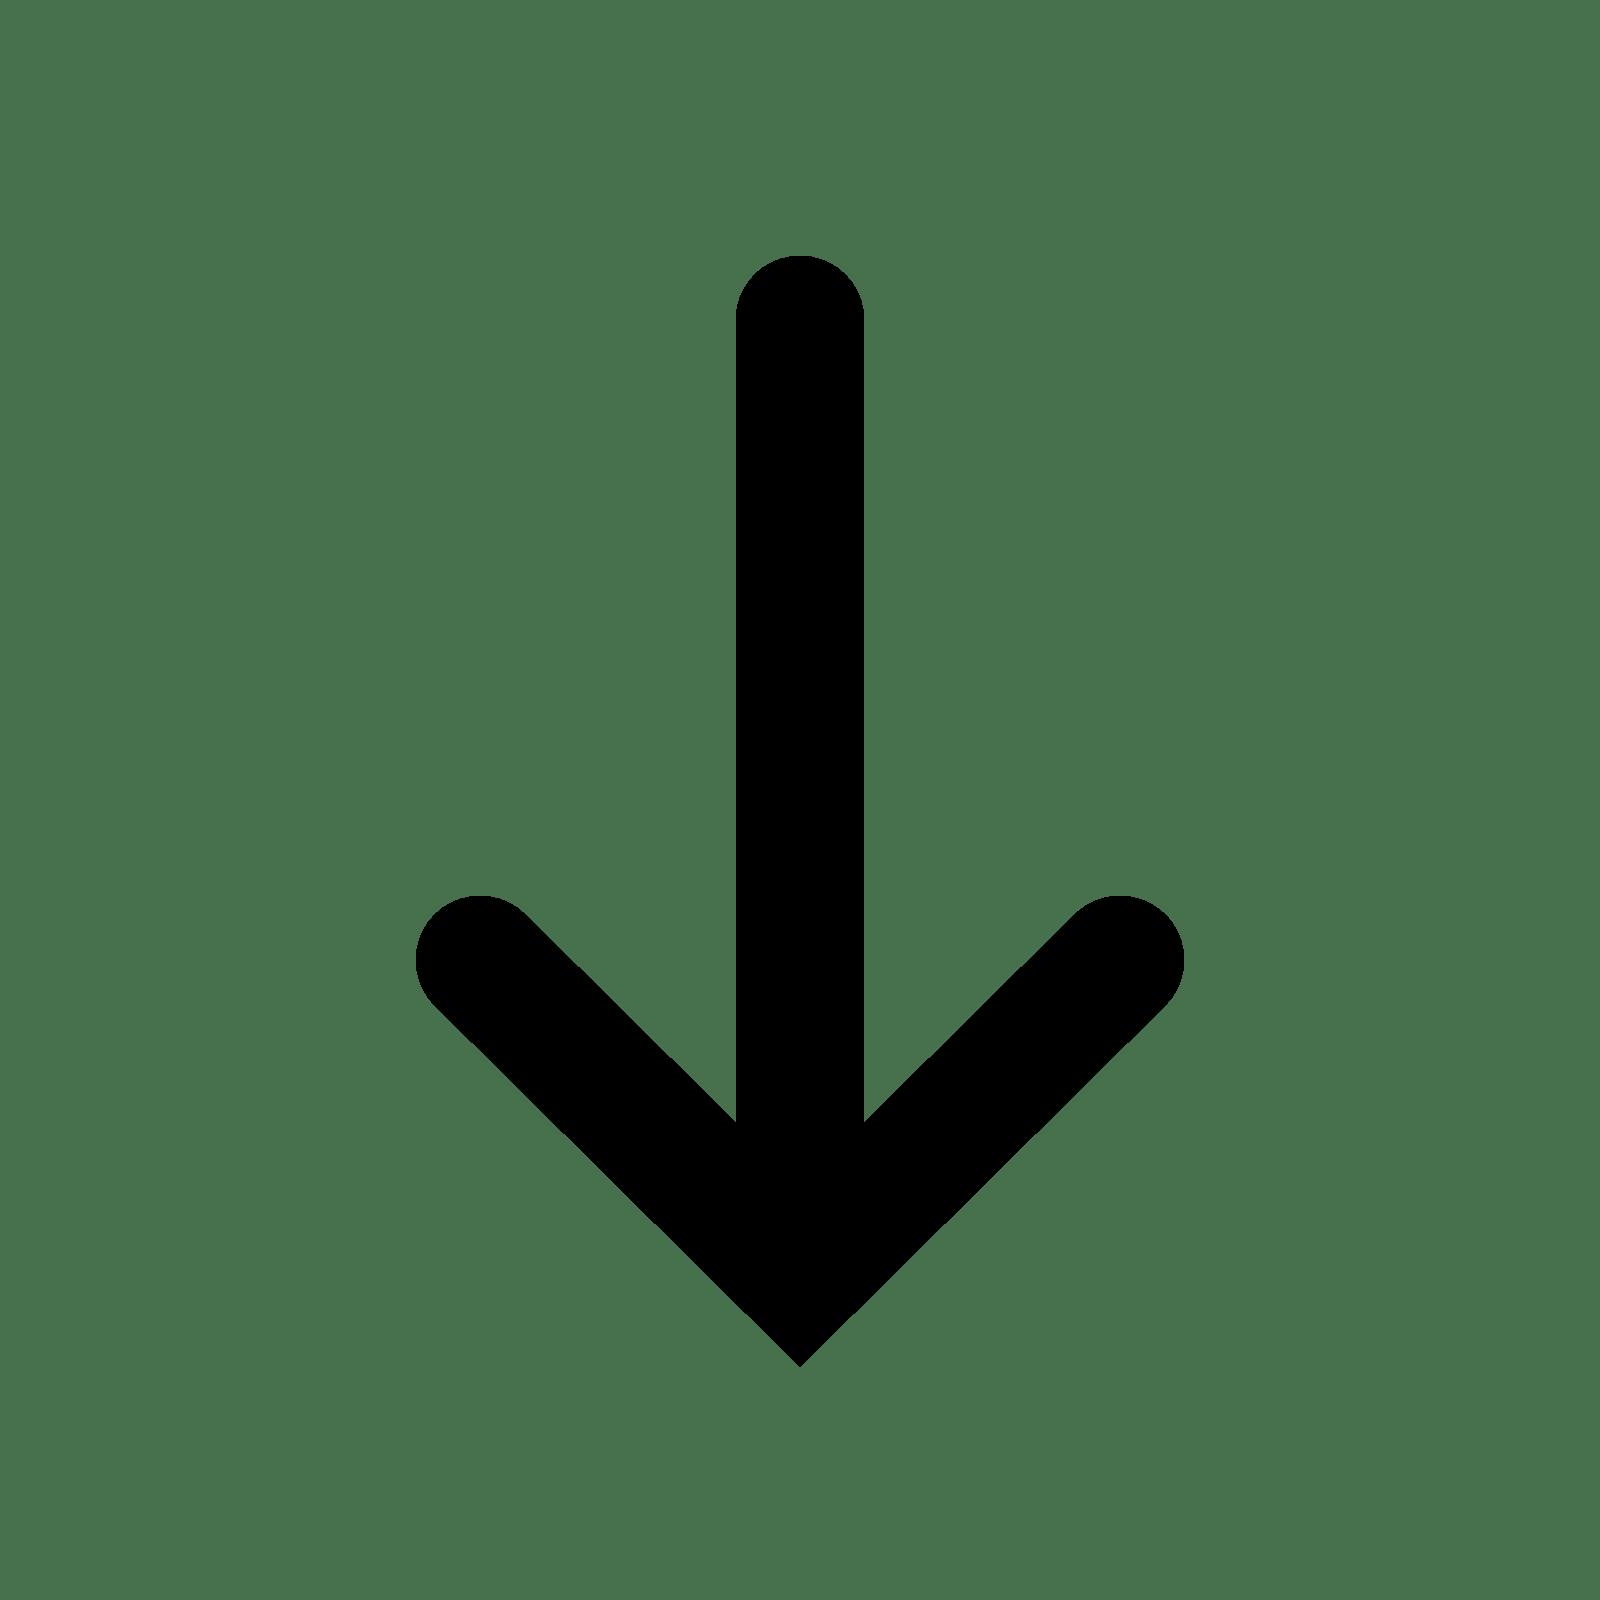 Down Arrow transparent PNG.